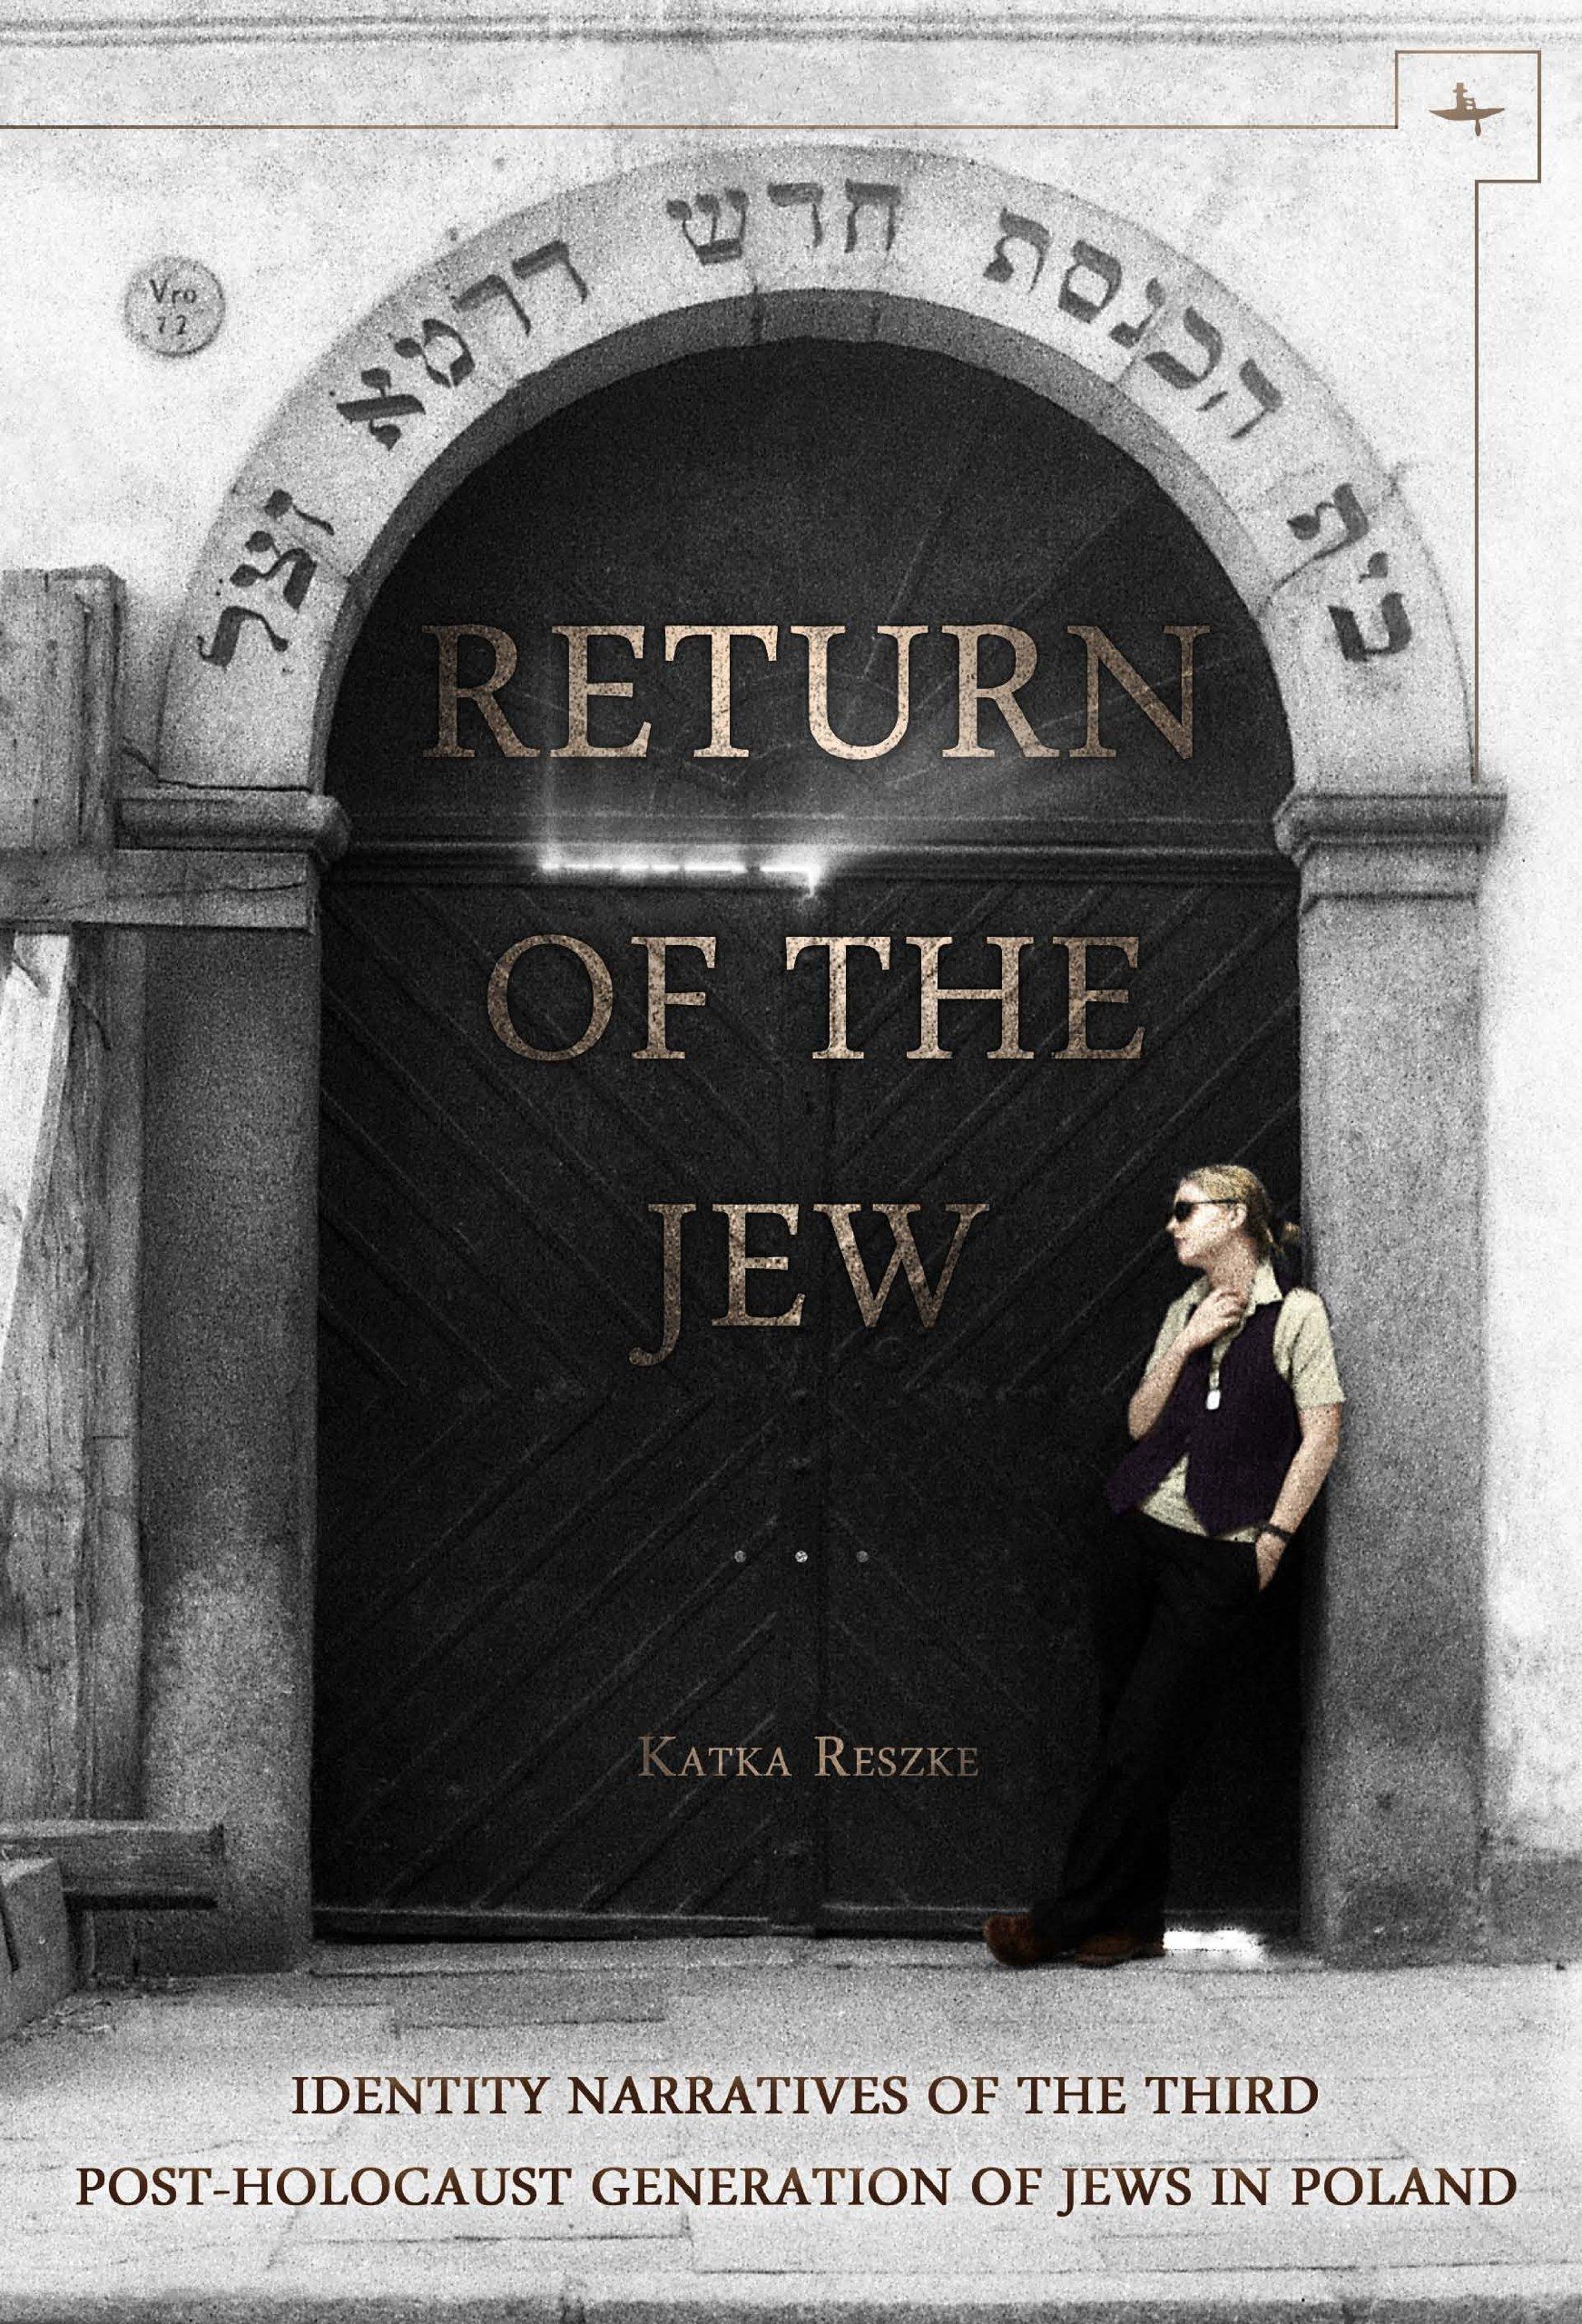 Return of the jew identity narratives of the third post holocaust return of the jew identity narratives of the third post holocaust generation of jews in poland jews of poland katka reszke 9781618113085 amazon fandeluxe Gallery